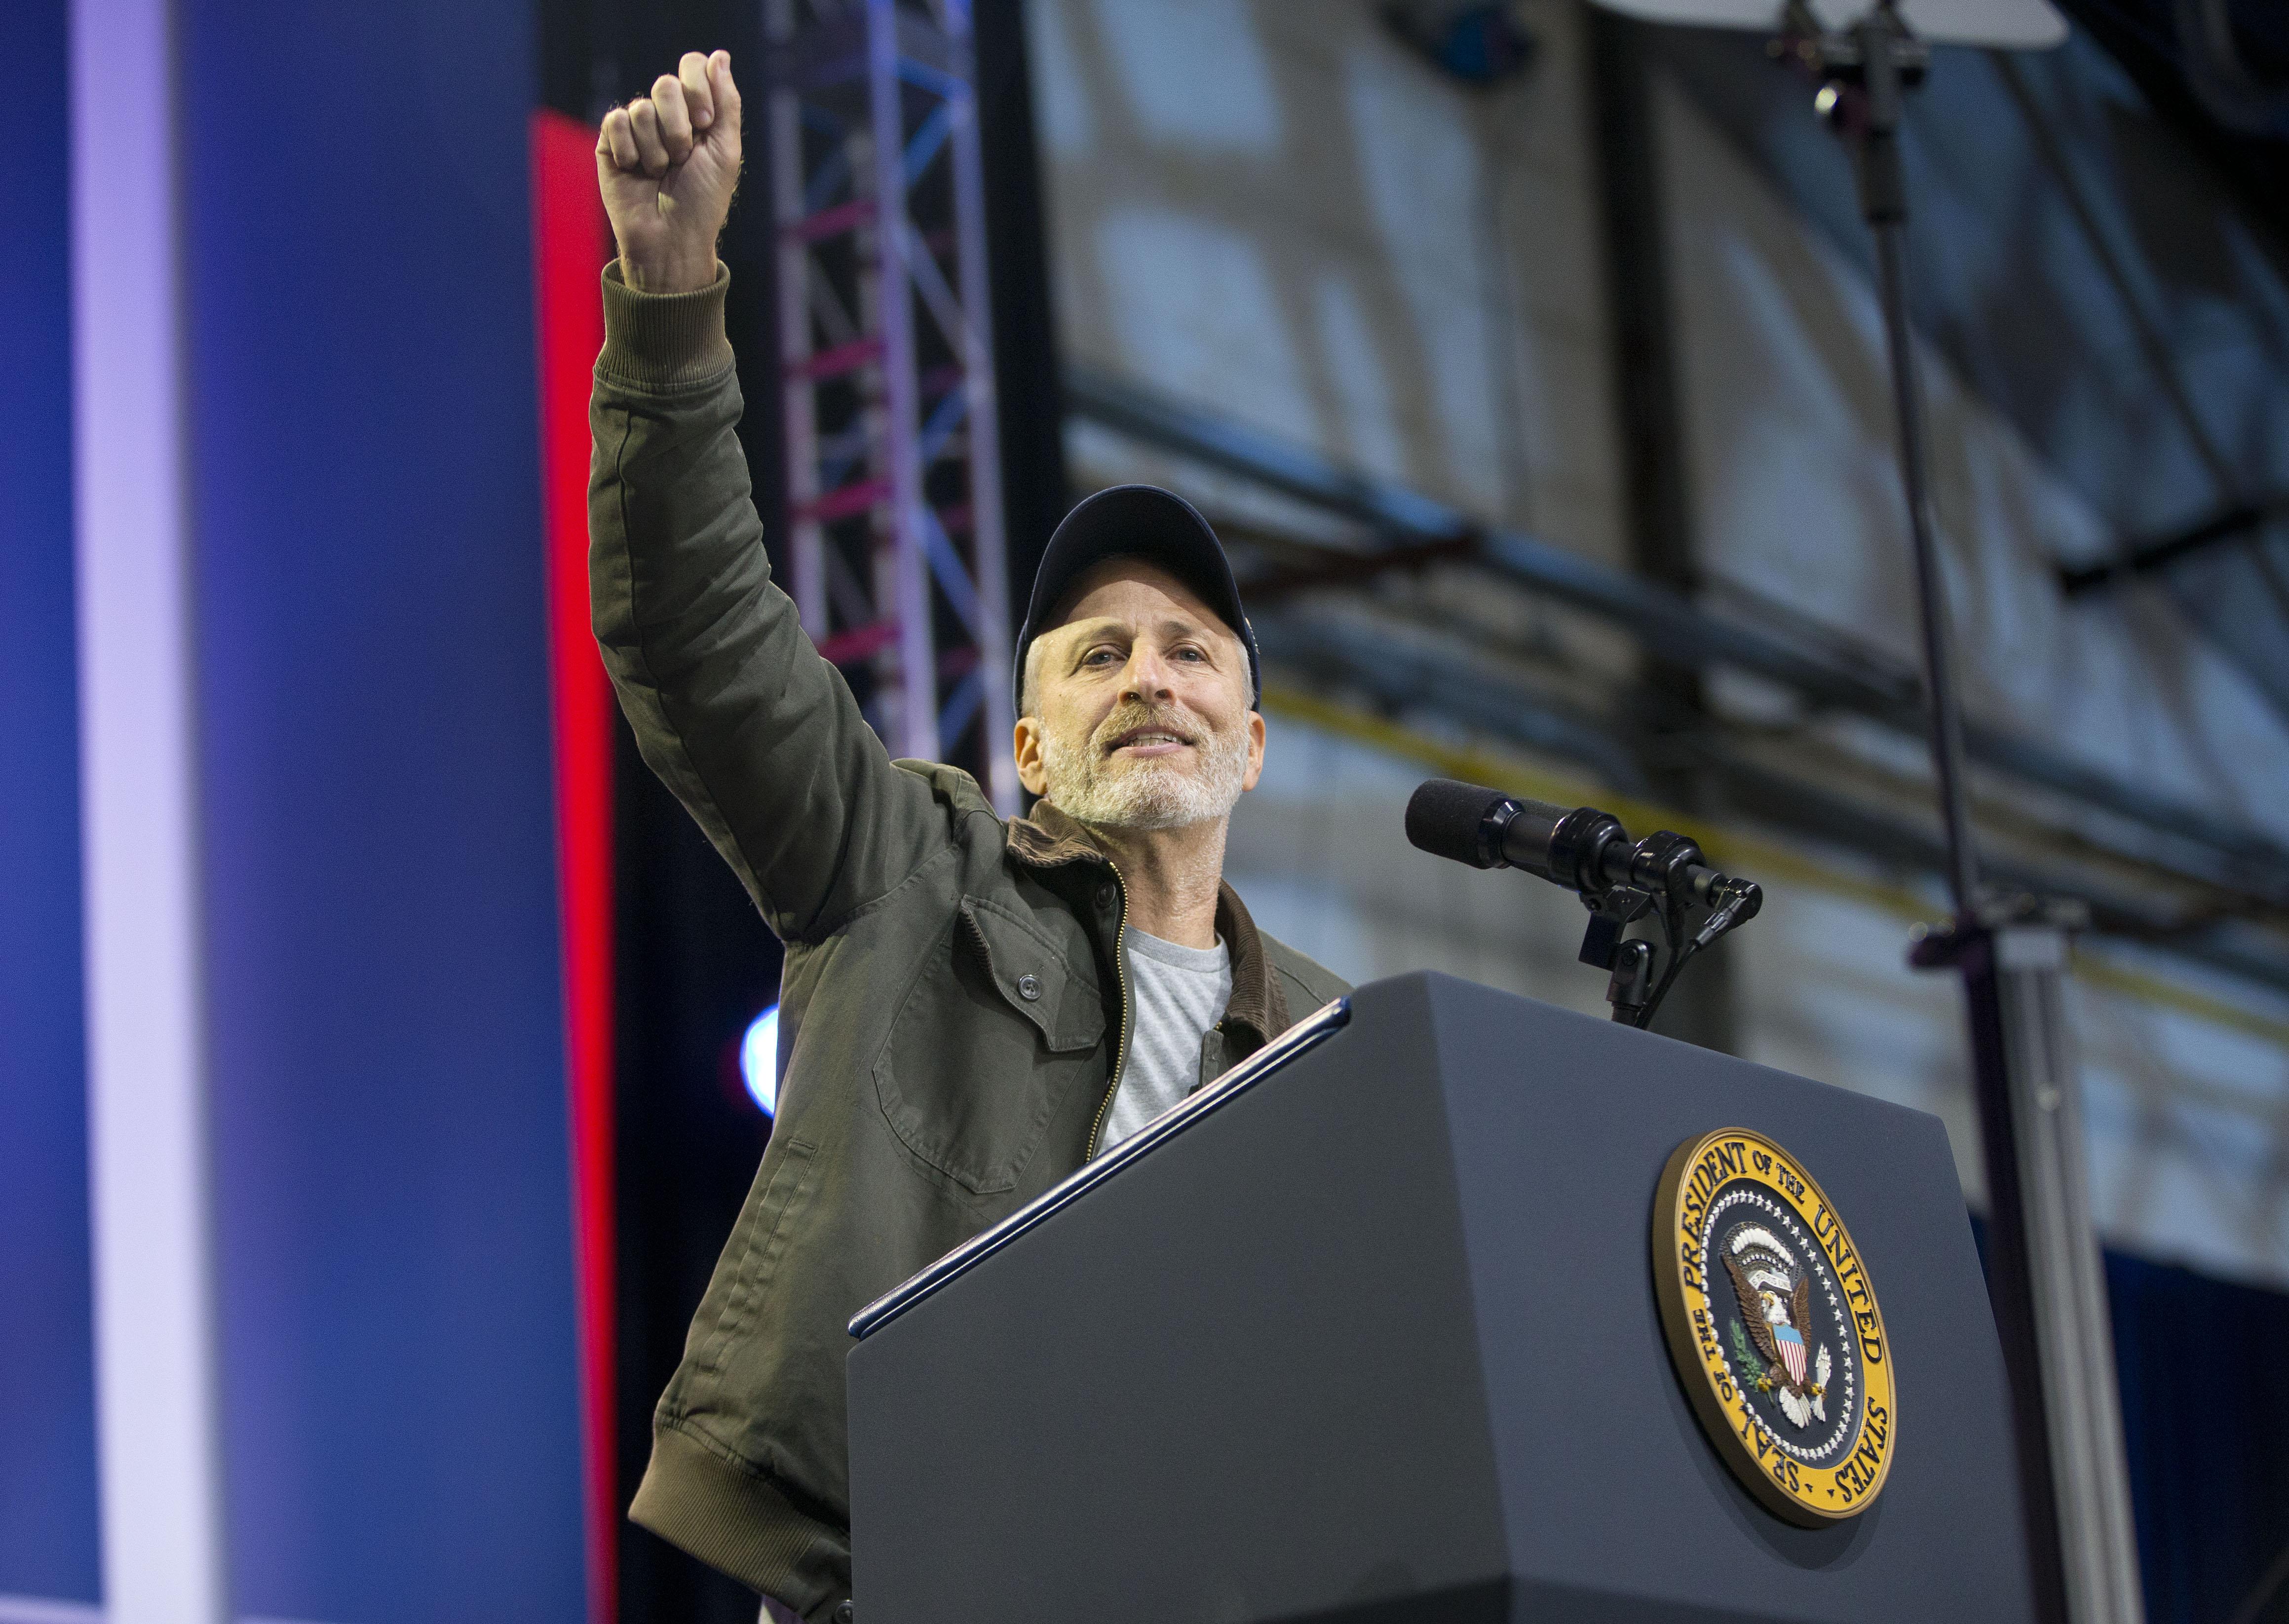 Jon Stewart offers advice to the media